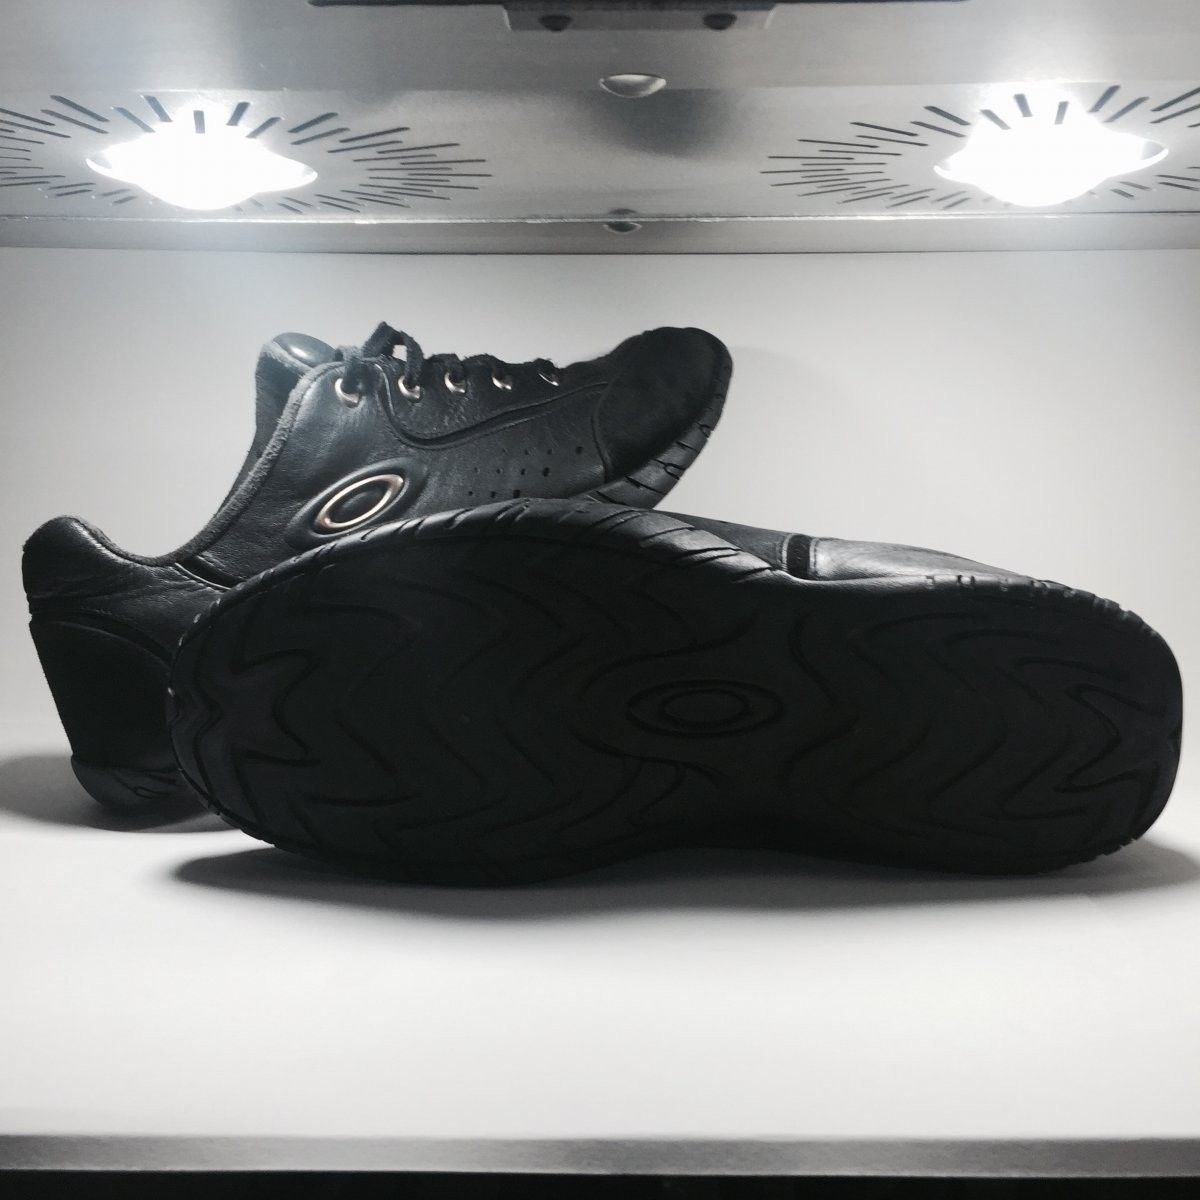 Oakley Shoes Size 12.5 Original Rip Cords Black/Chrome - Oakley Rip Cord Black Chrome (1).jpg